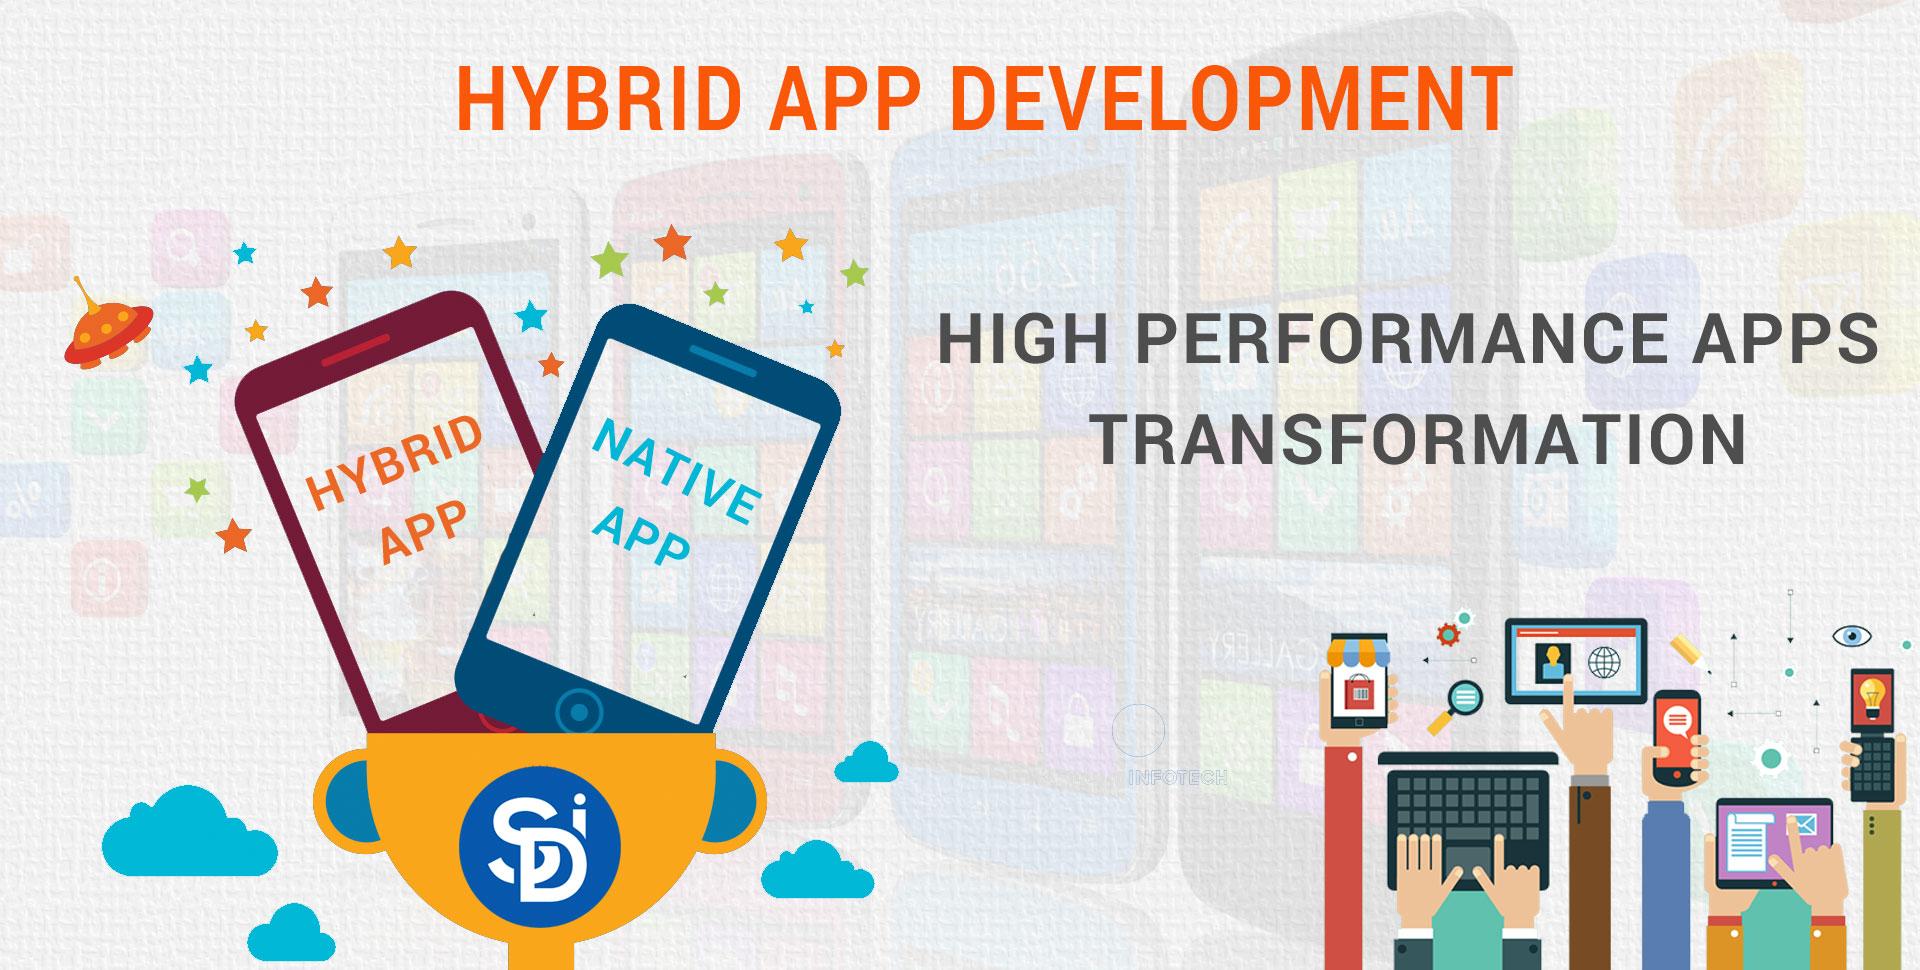 Hybrid App Development – High Performance Apps